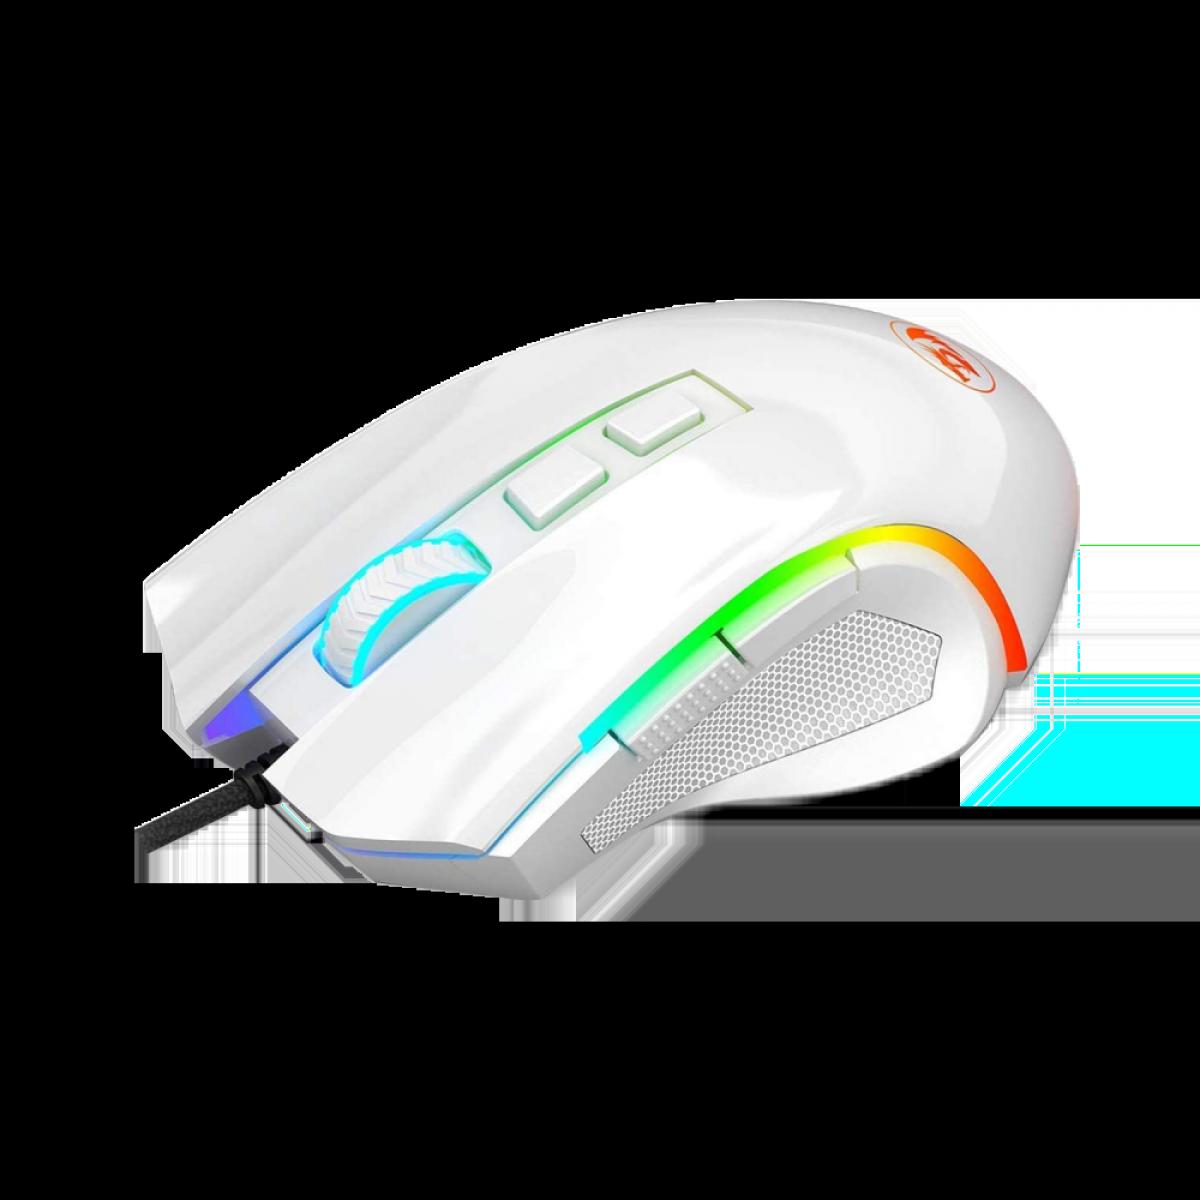 Mouse Redragon Gamer Griffin M607 RGB, 7200 DPI, 6 Botões, White